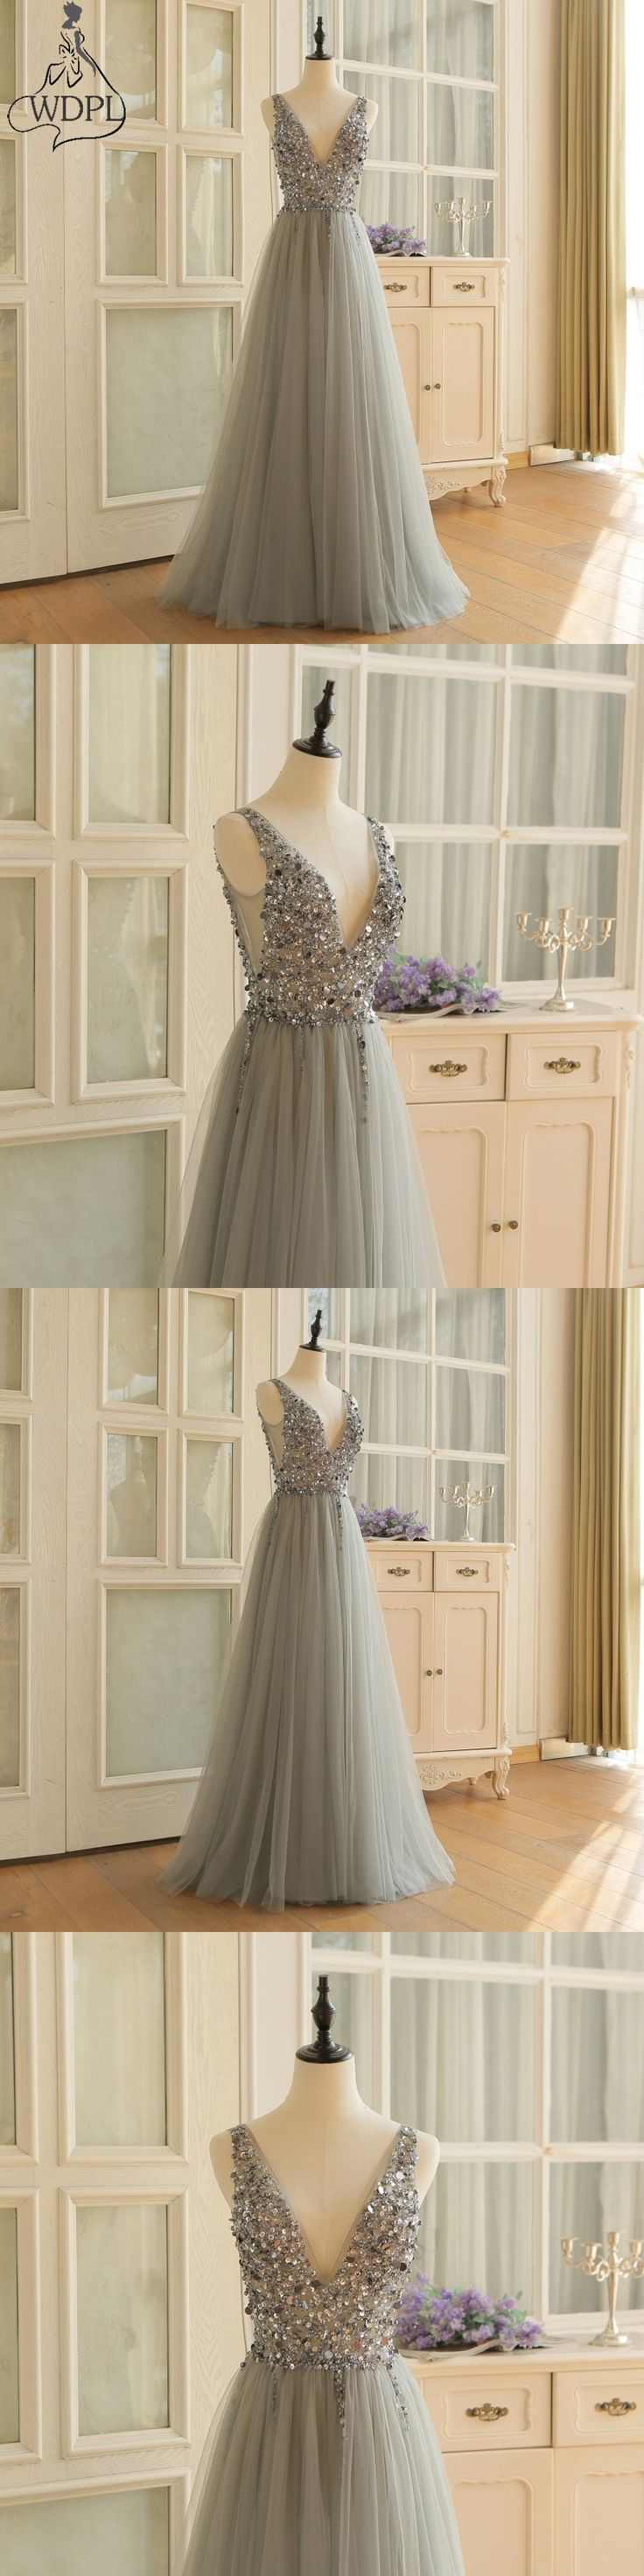 Sexy High Split Long Prom Dresses 2018 Gray Tulle Beaded Formal Evening Dress Spaghetti Strap Sleeveless Vestidos Para Festa